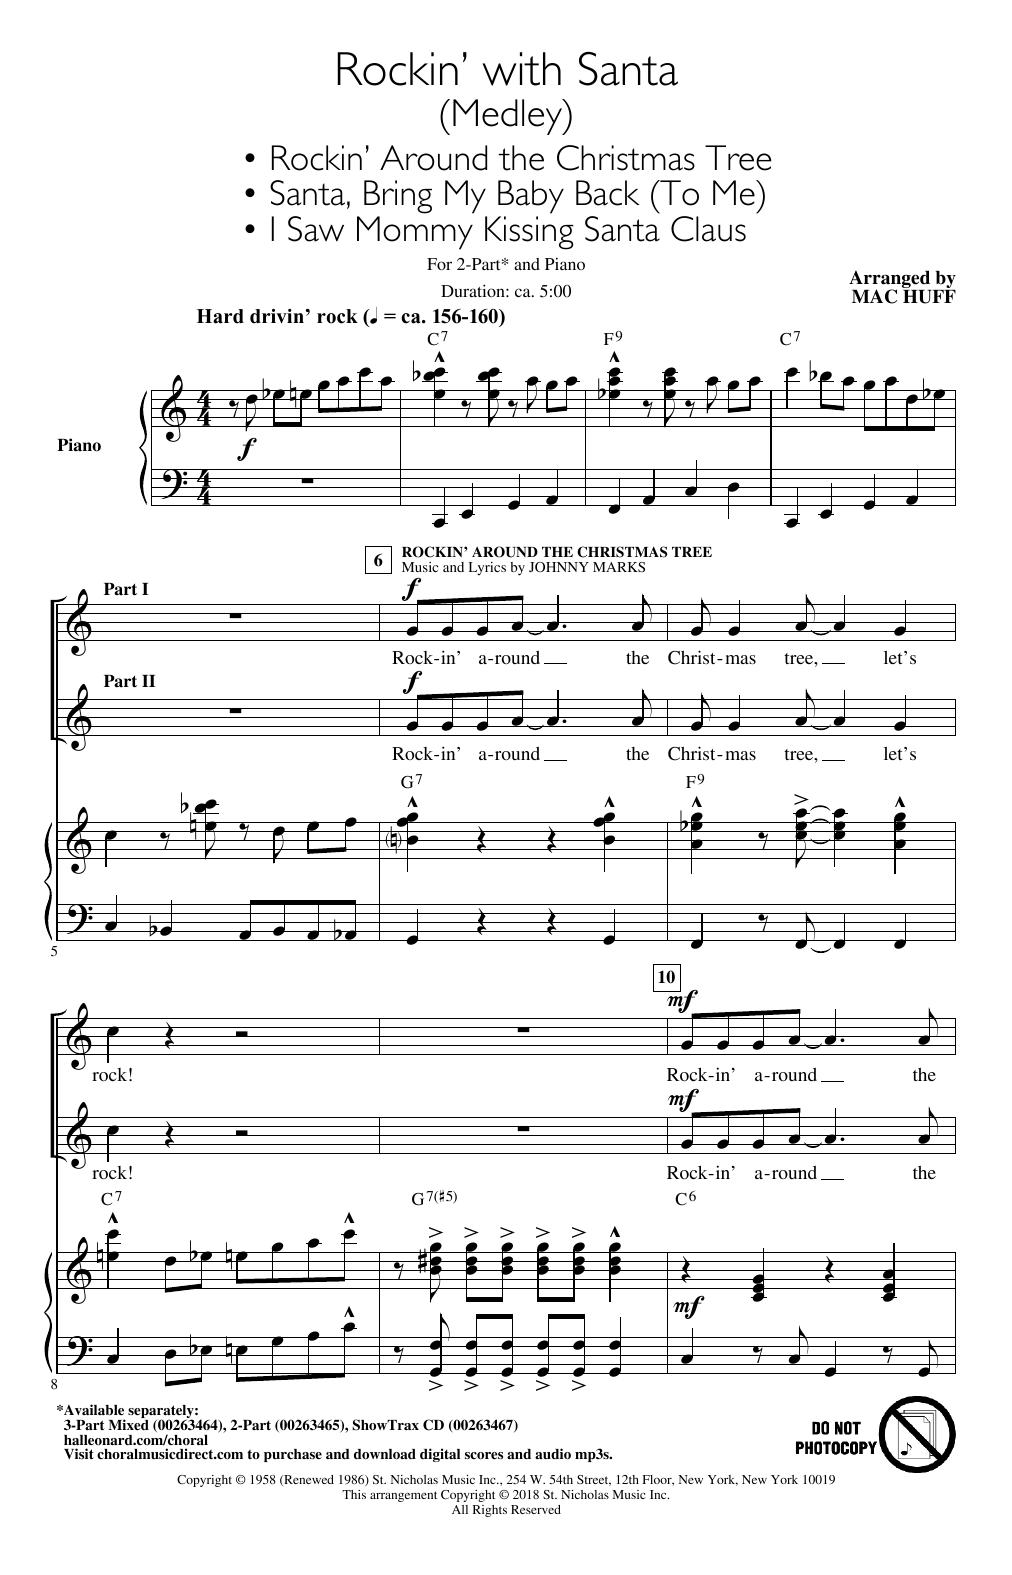 Rockin' With Santa (Medley) (arr. Mac Huff) (2-Part Choir)